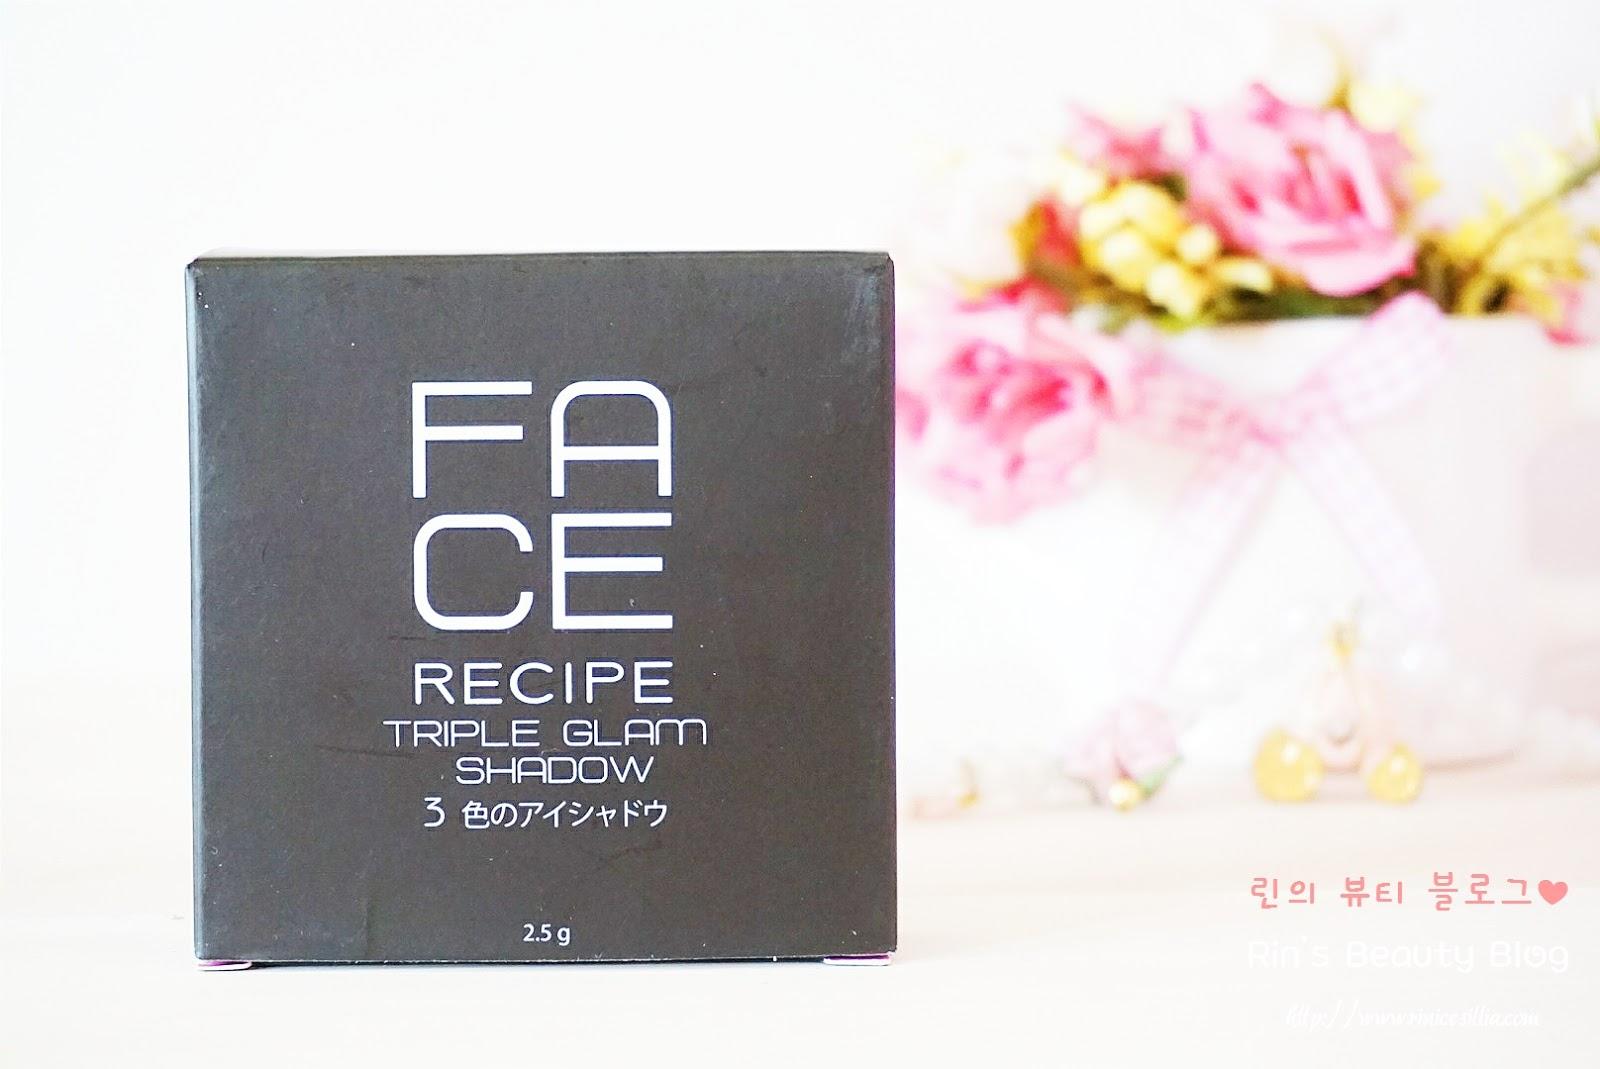 Face Recipe Triple Glam Shadow